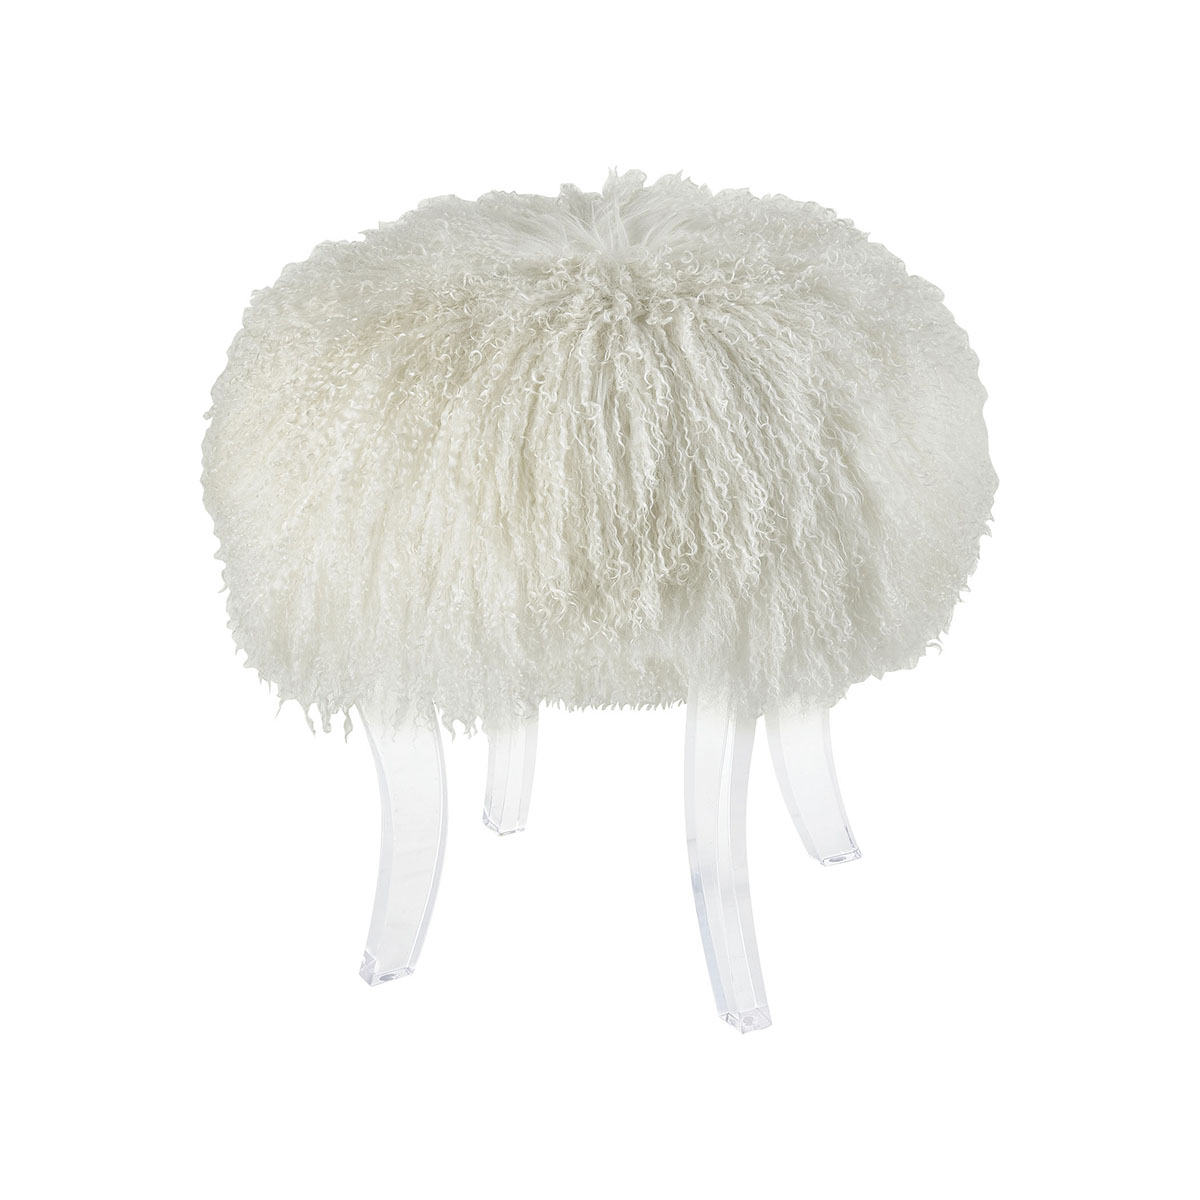 Hair Apparent Stool | Elk Home